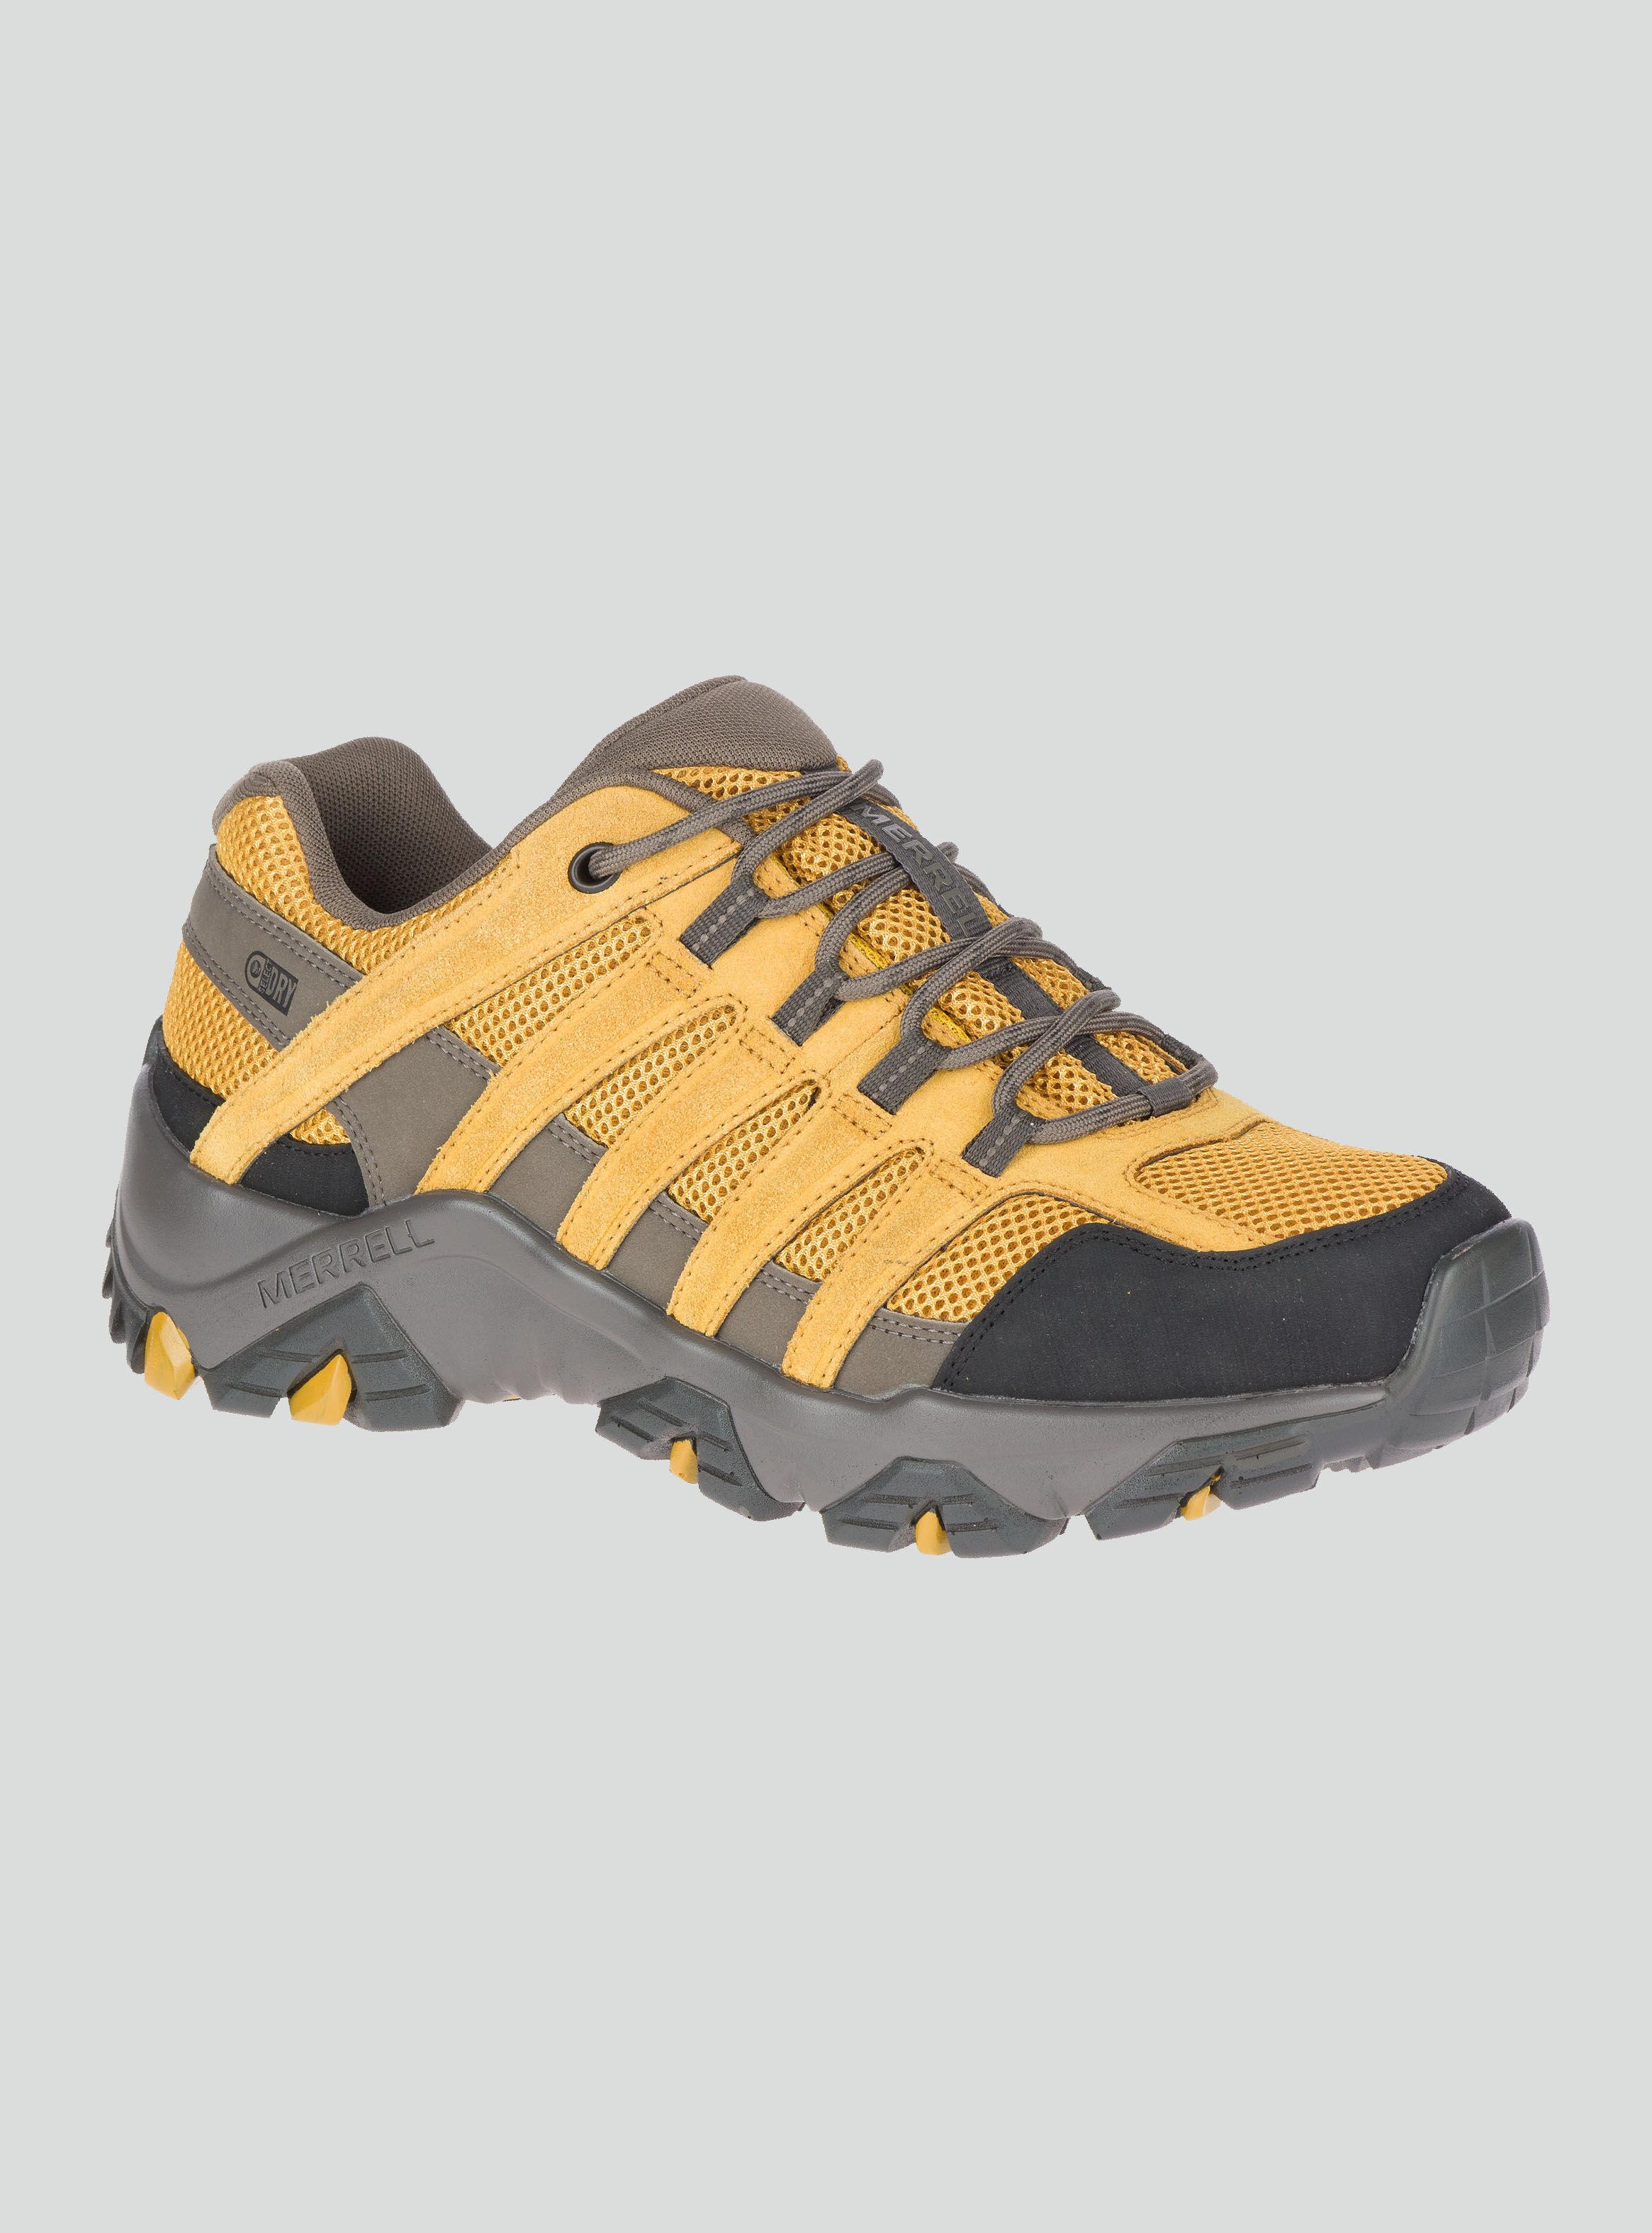 zapatos merrell paris 12